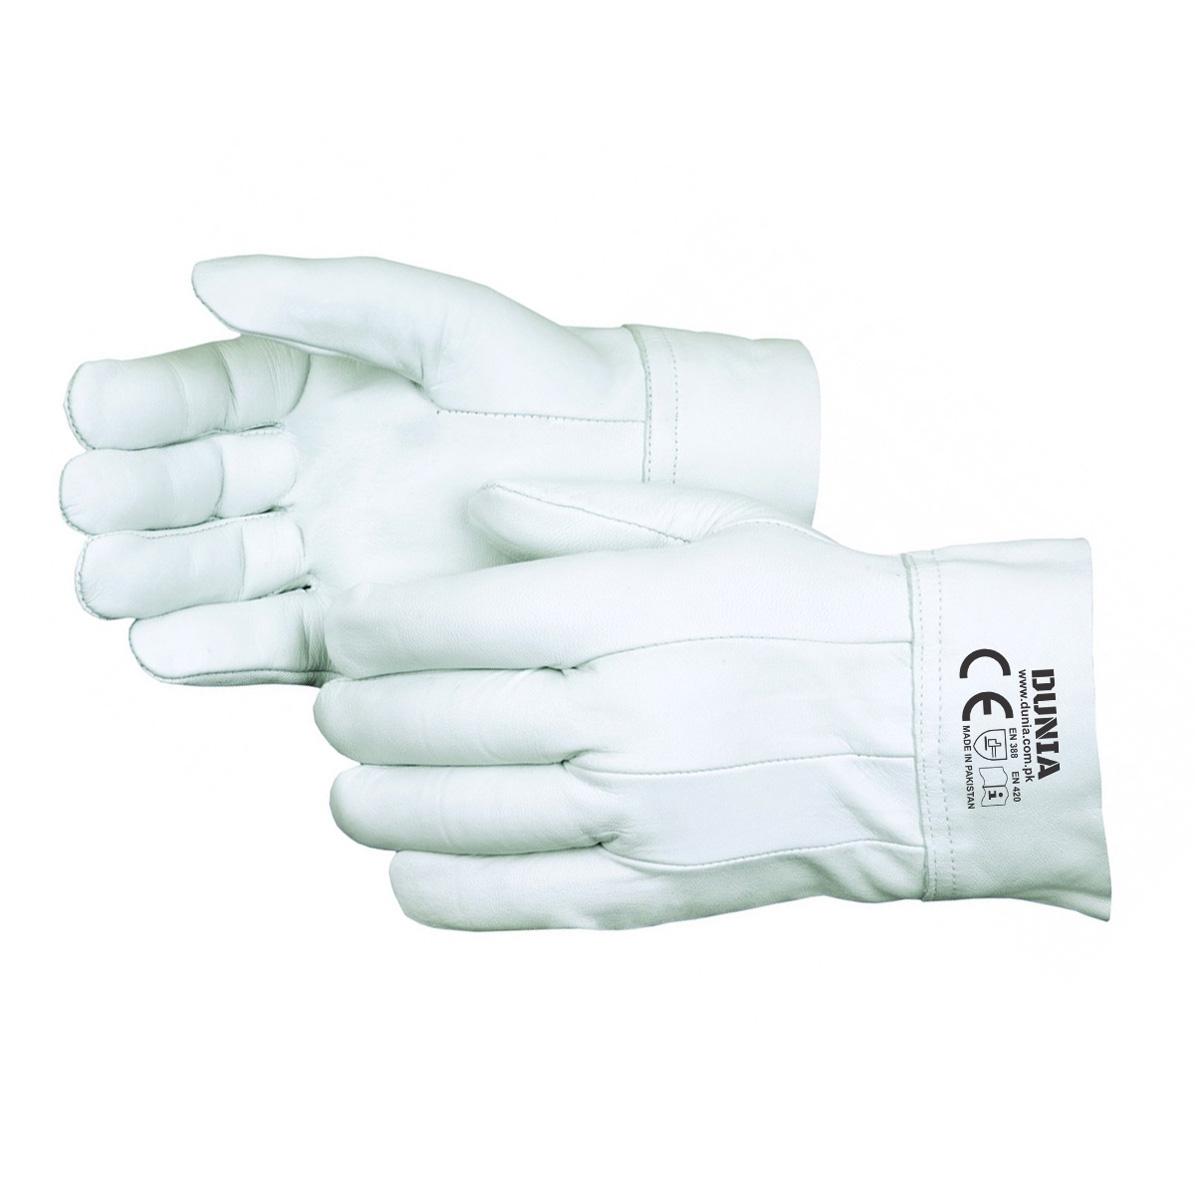 DTC-482 Grain Leather Welder Gloves